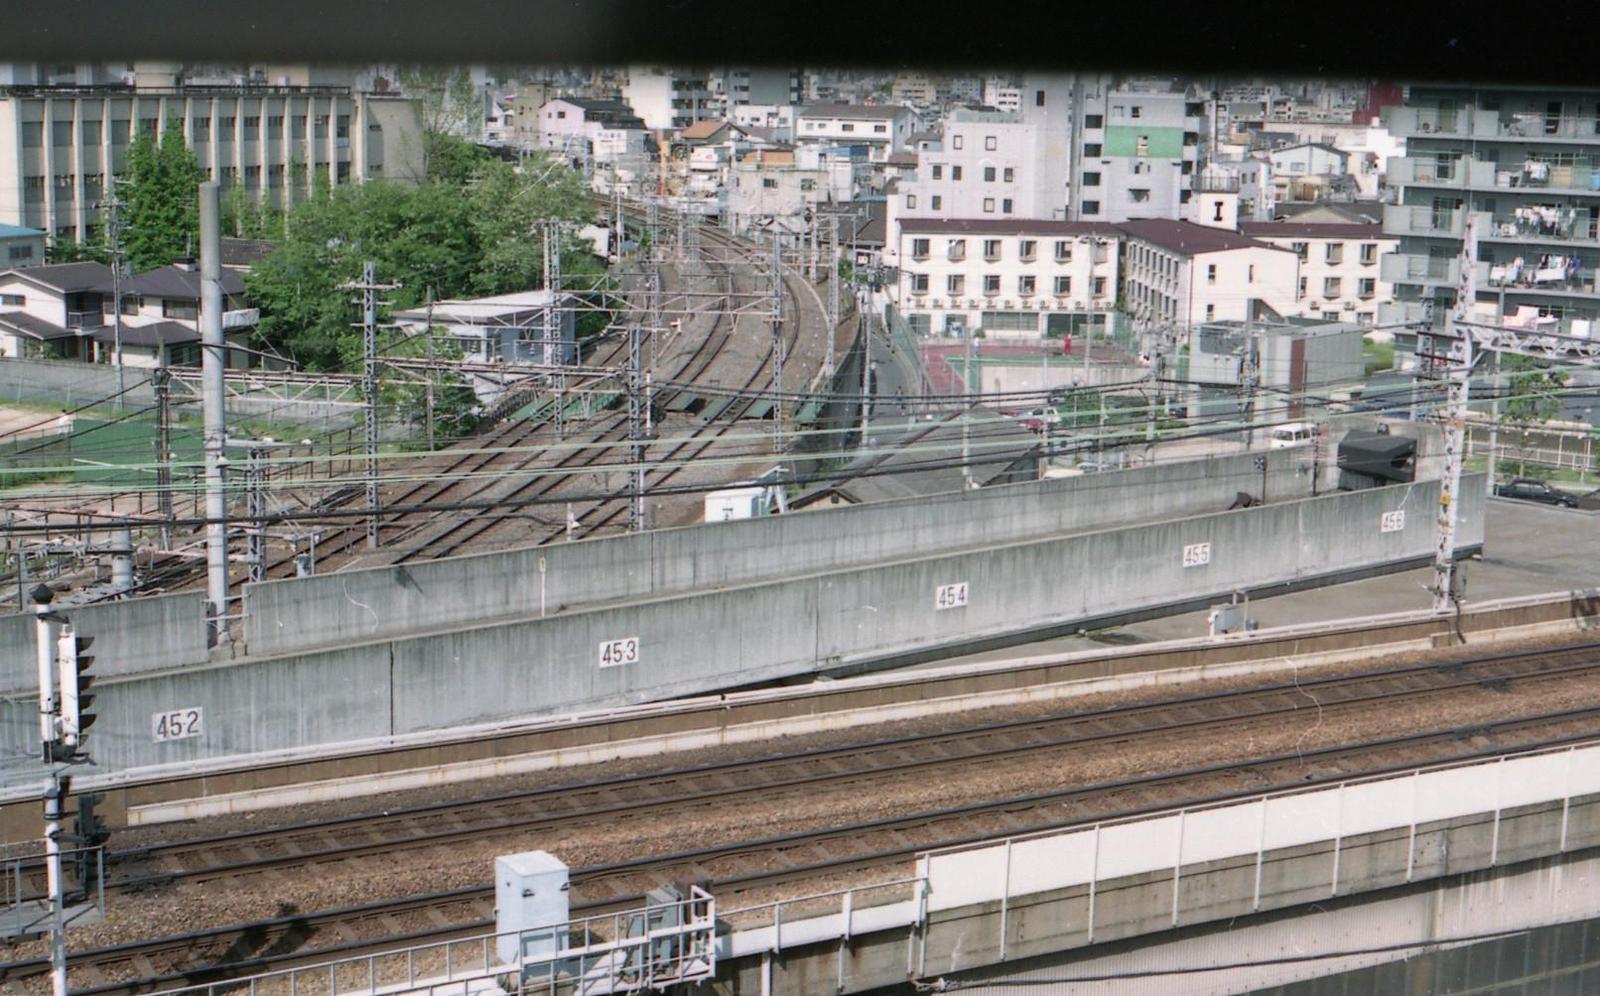 19920510d104